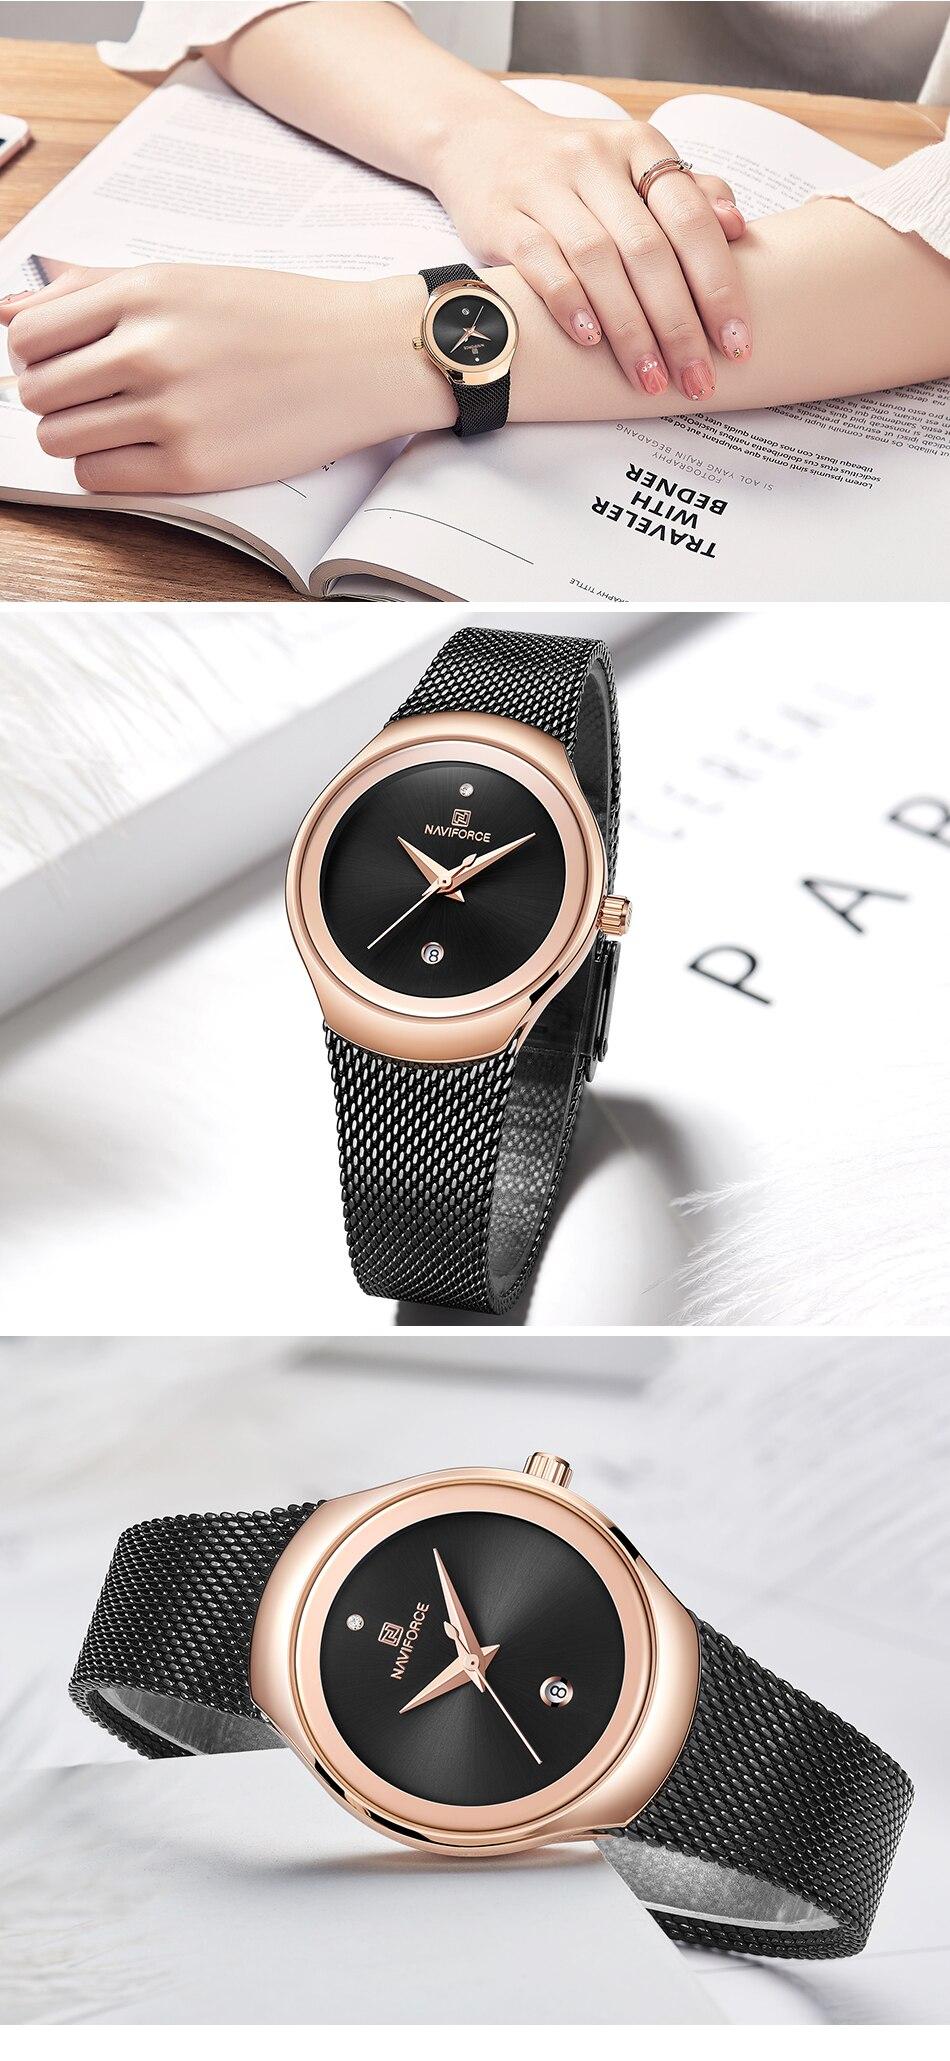 NAVIFORCE Top Luxury Brand Women Watches Female Fashion Simple Quartz Watch Ladies Classic Stainless Steel Mesh Belt Wrist Watch 12